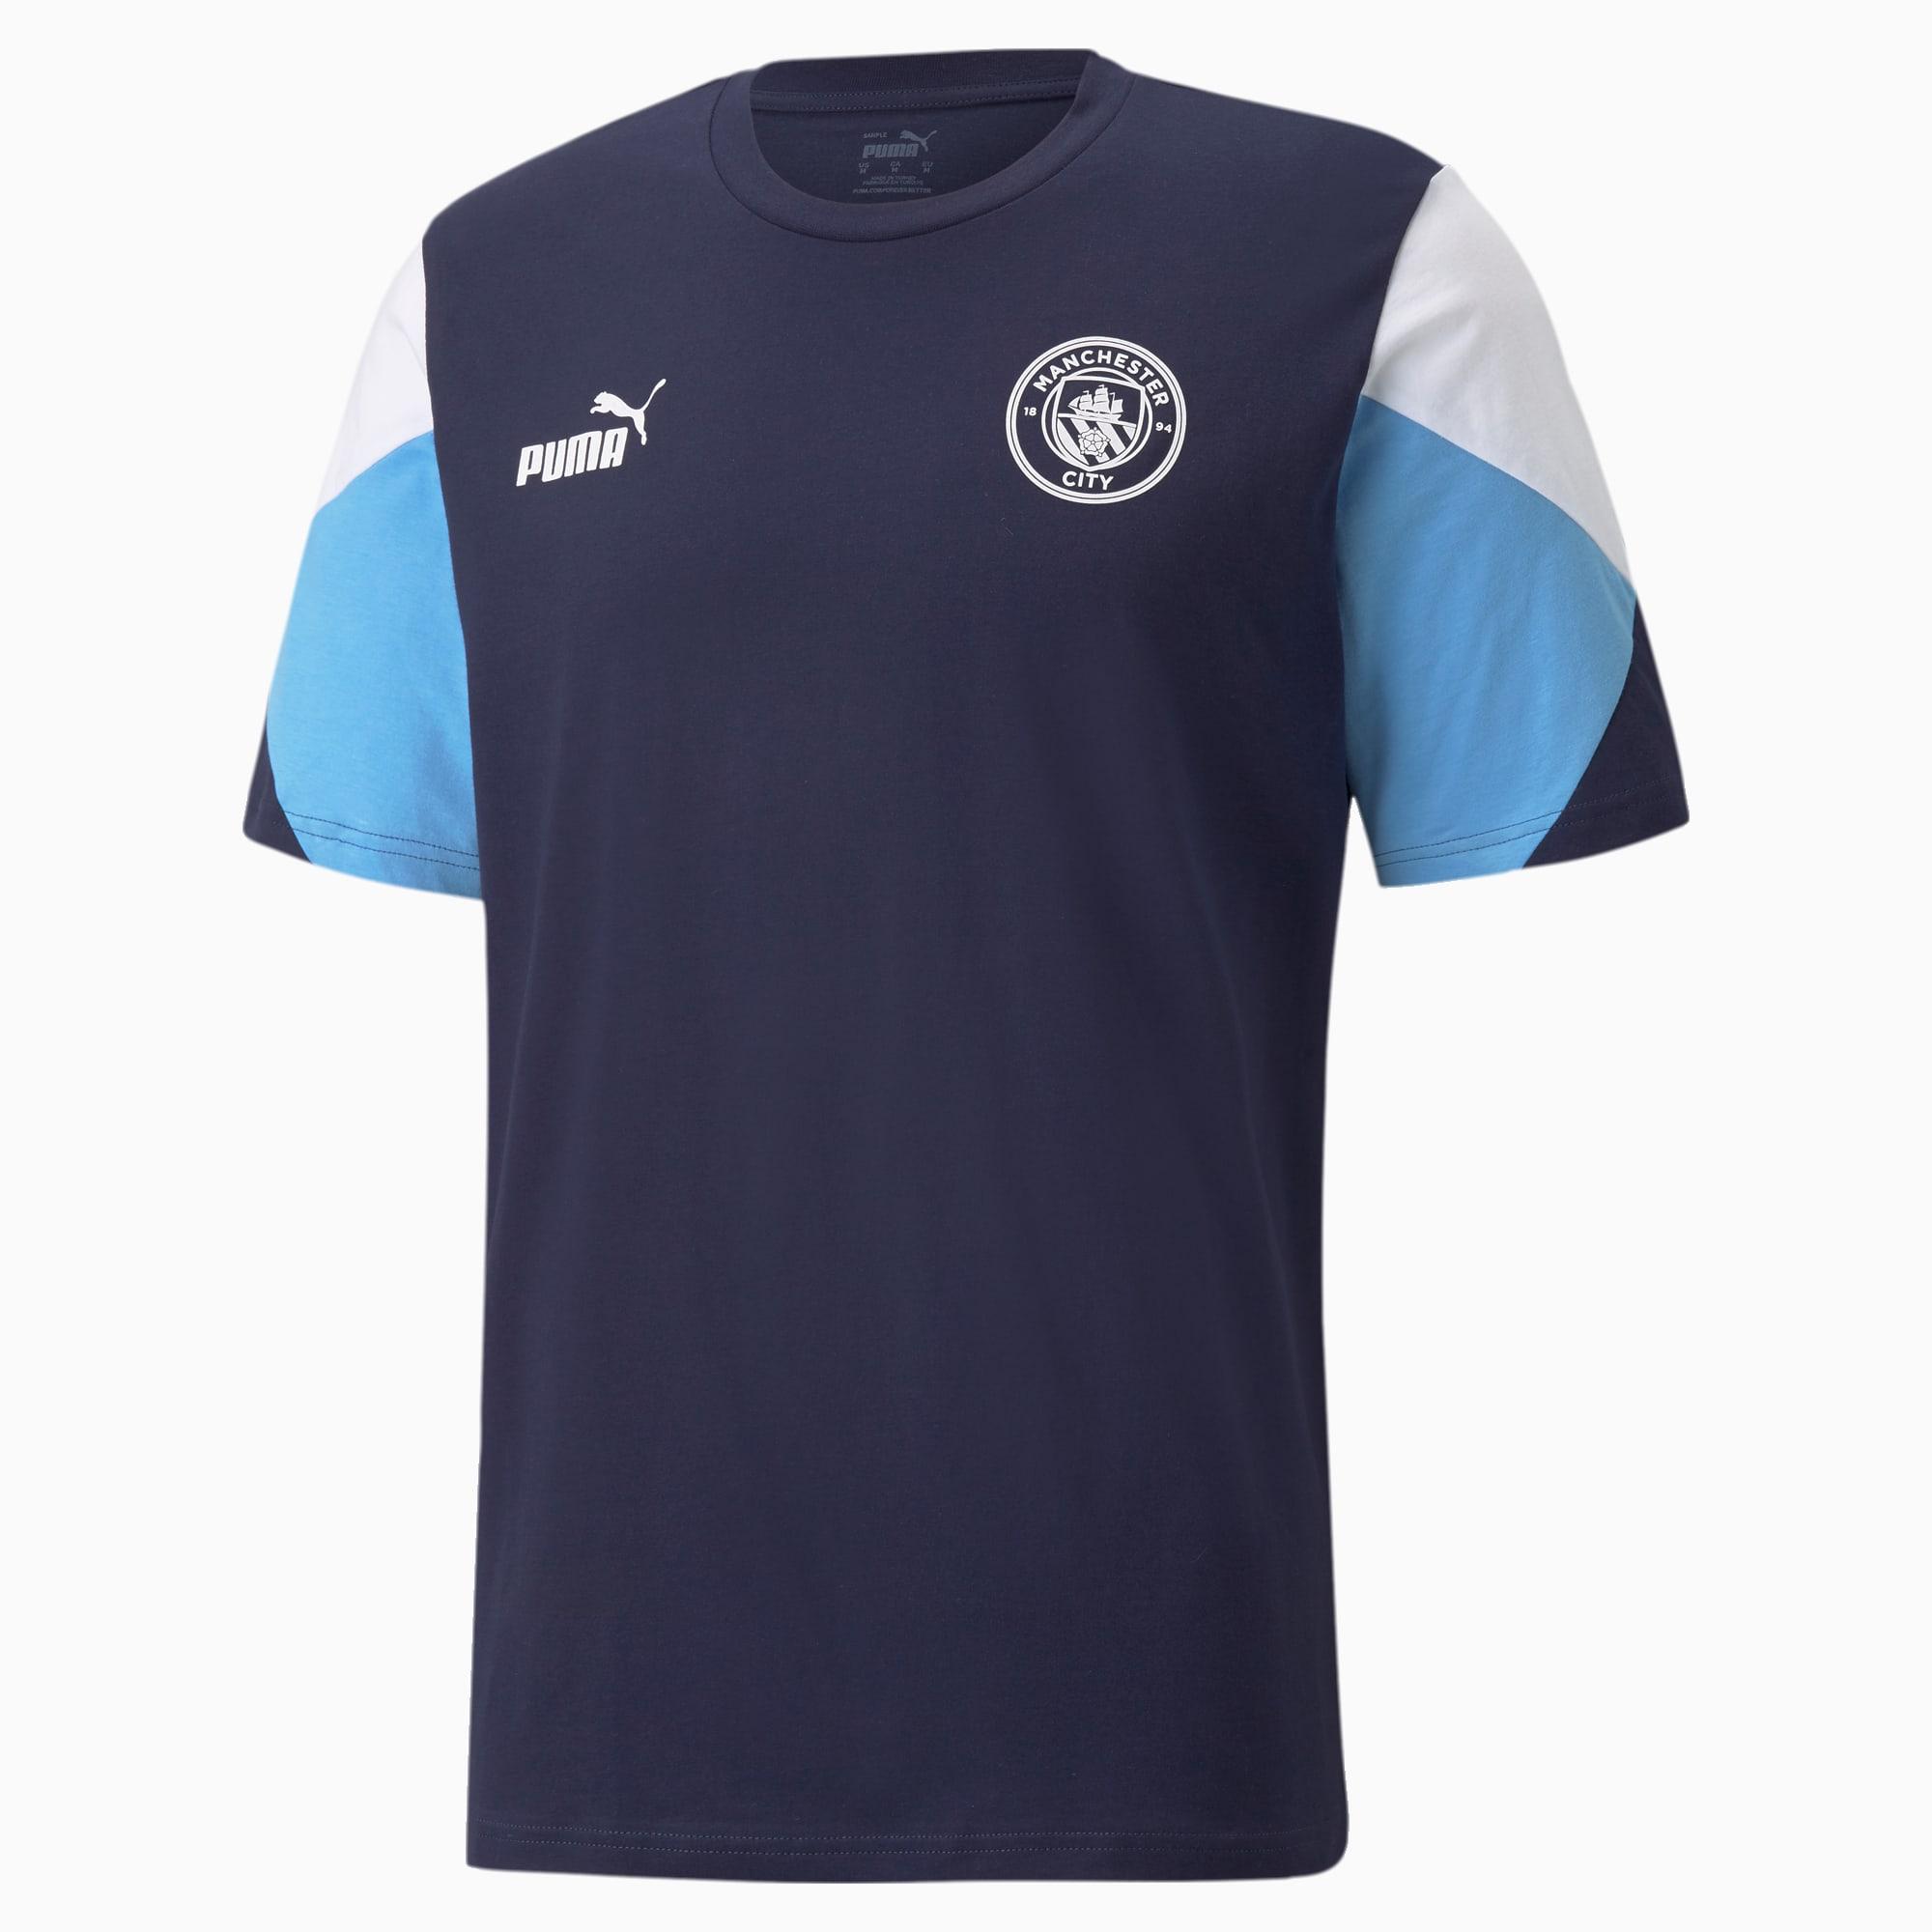 Man City FtblCulture voetbal-T-shirt, Blauw/Wit, Maat 3XL   PUMA